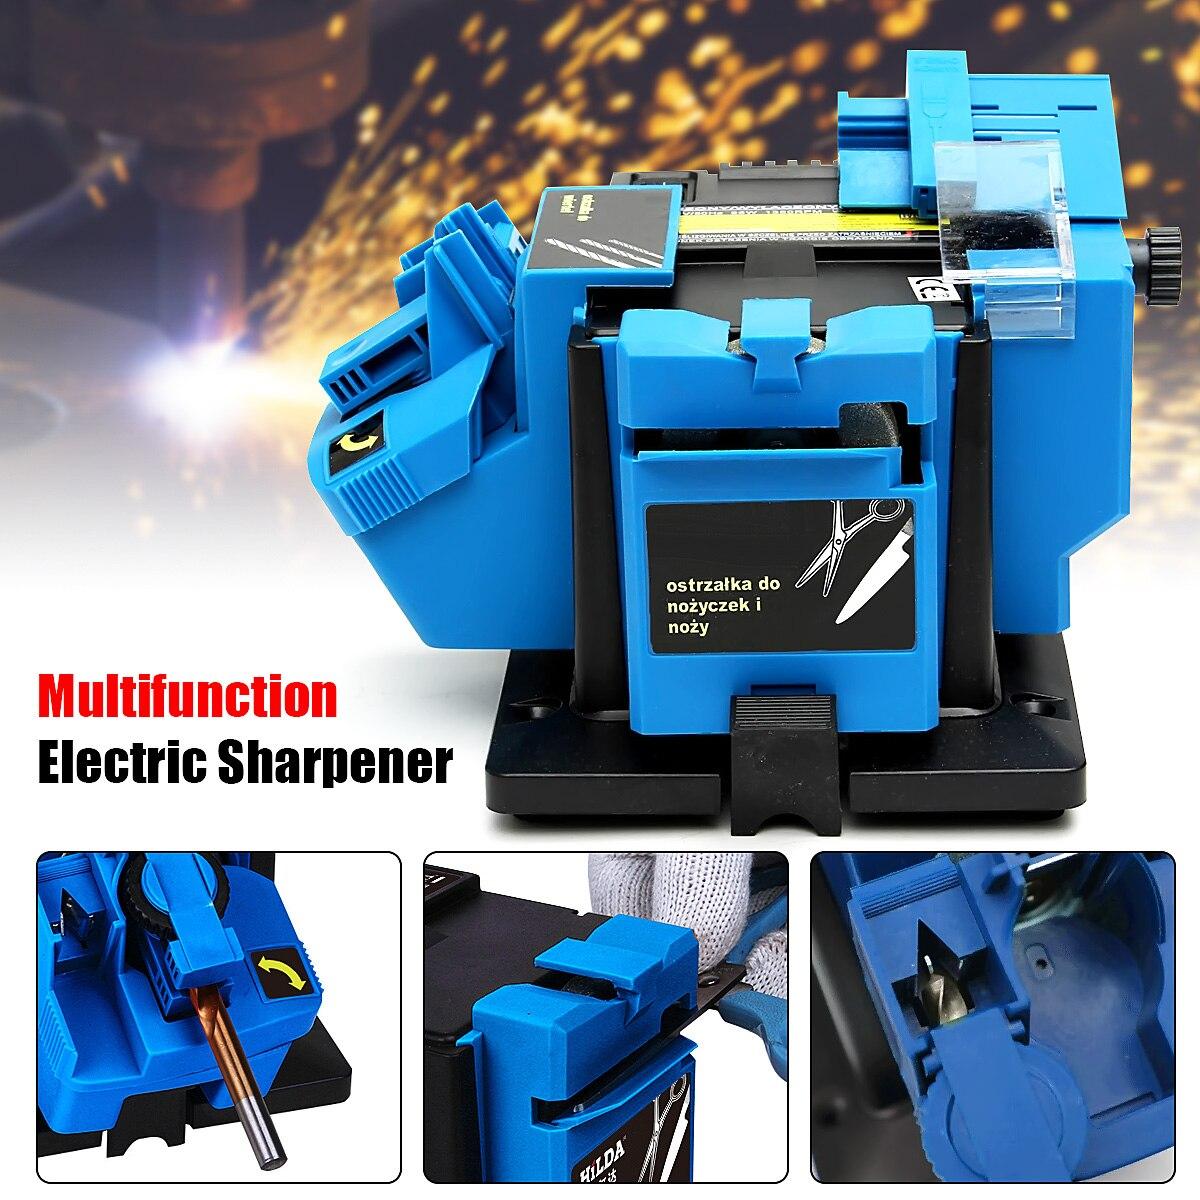 220V Multifunctional Sharpener Mini Electric Metal Grinder Grinding Tool Sharpener For Knives Scissors,planer Iron,drills